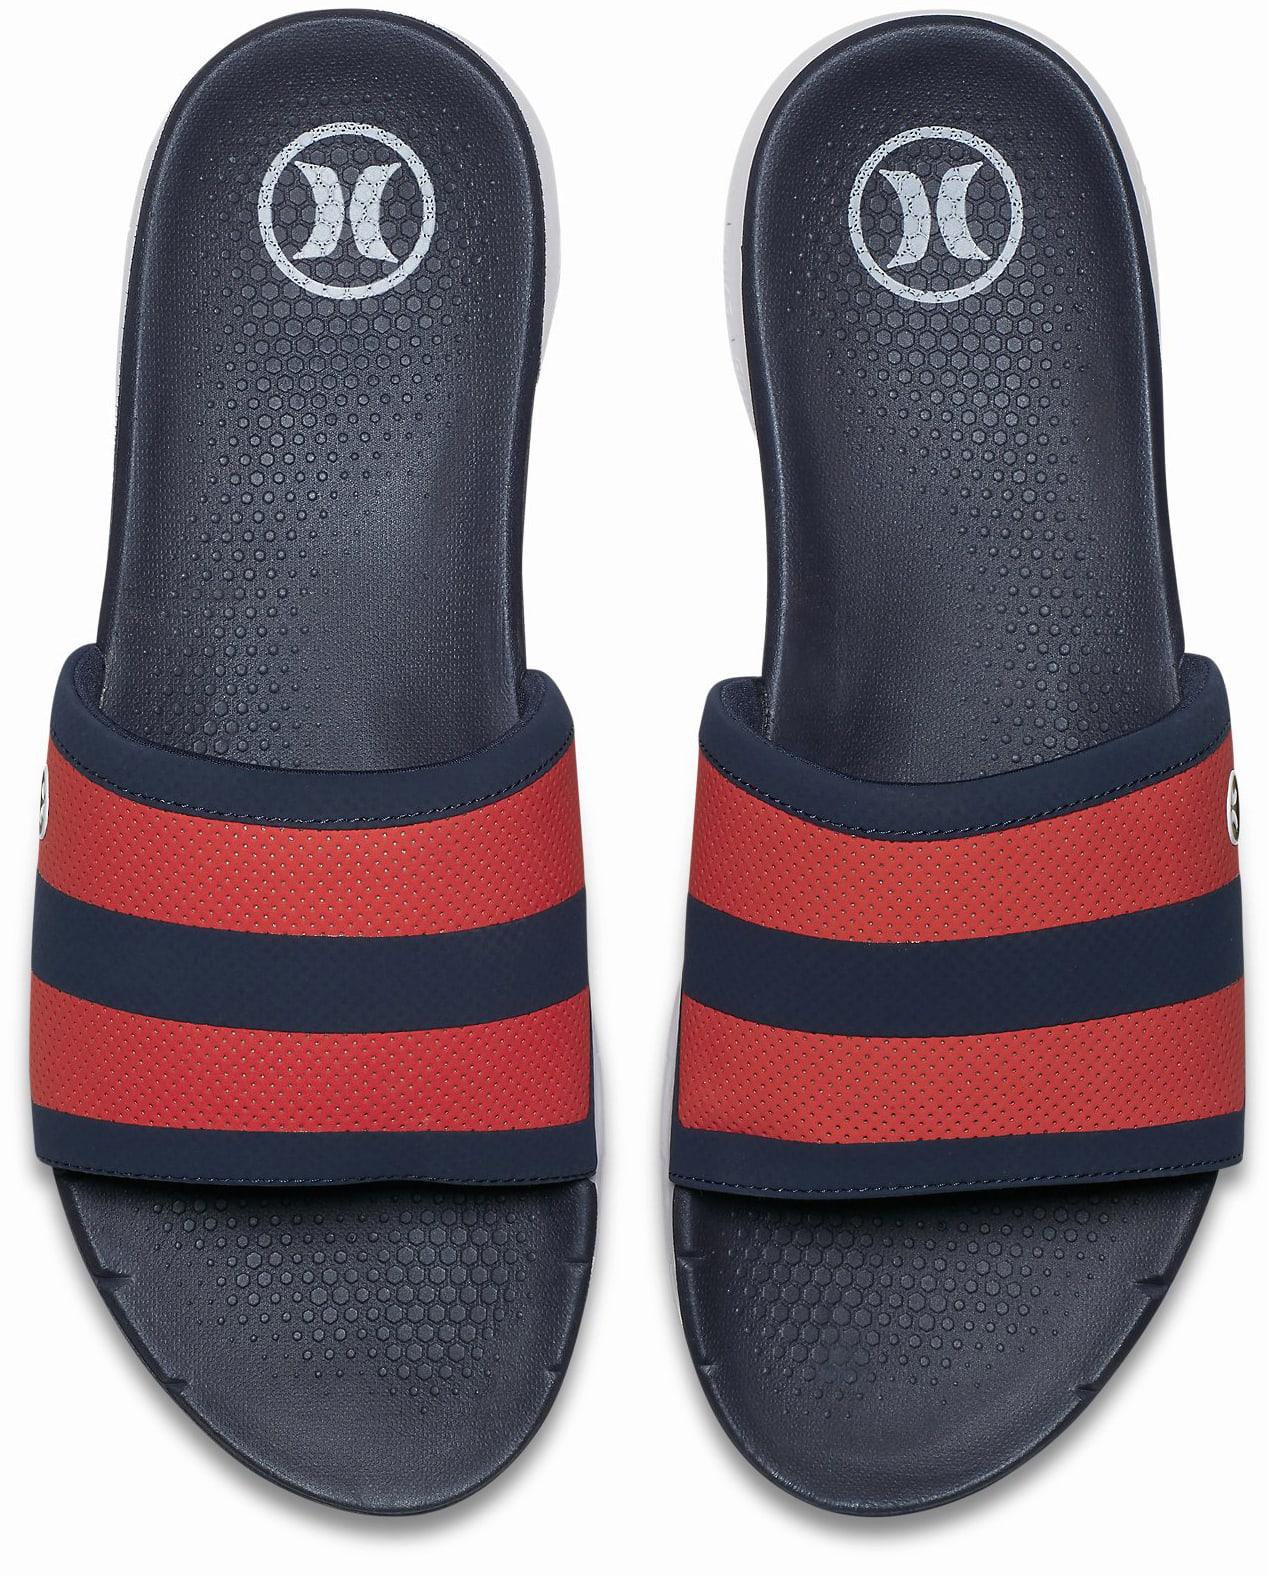 ab5fdc43d2a Hurley Phantom Free Slide Sandals - thumbnail 2